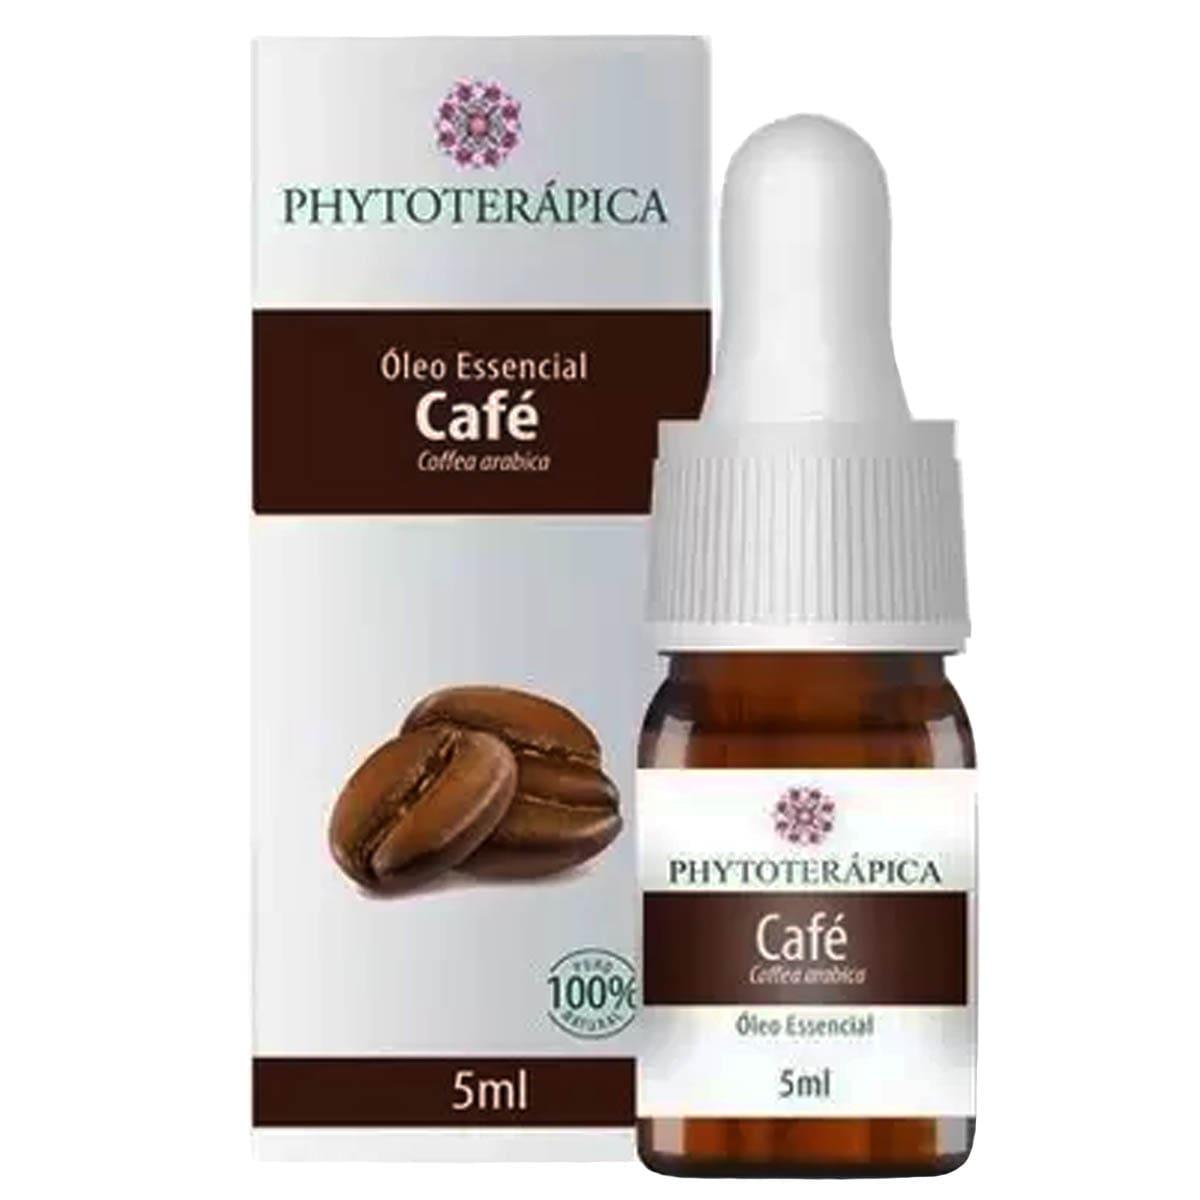 Óleo Essencial Café 5ml Phytoterápica